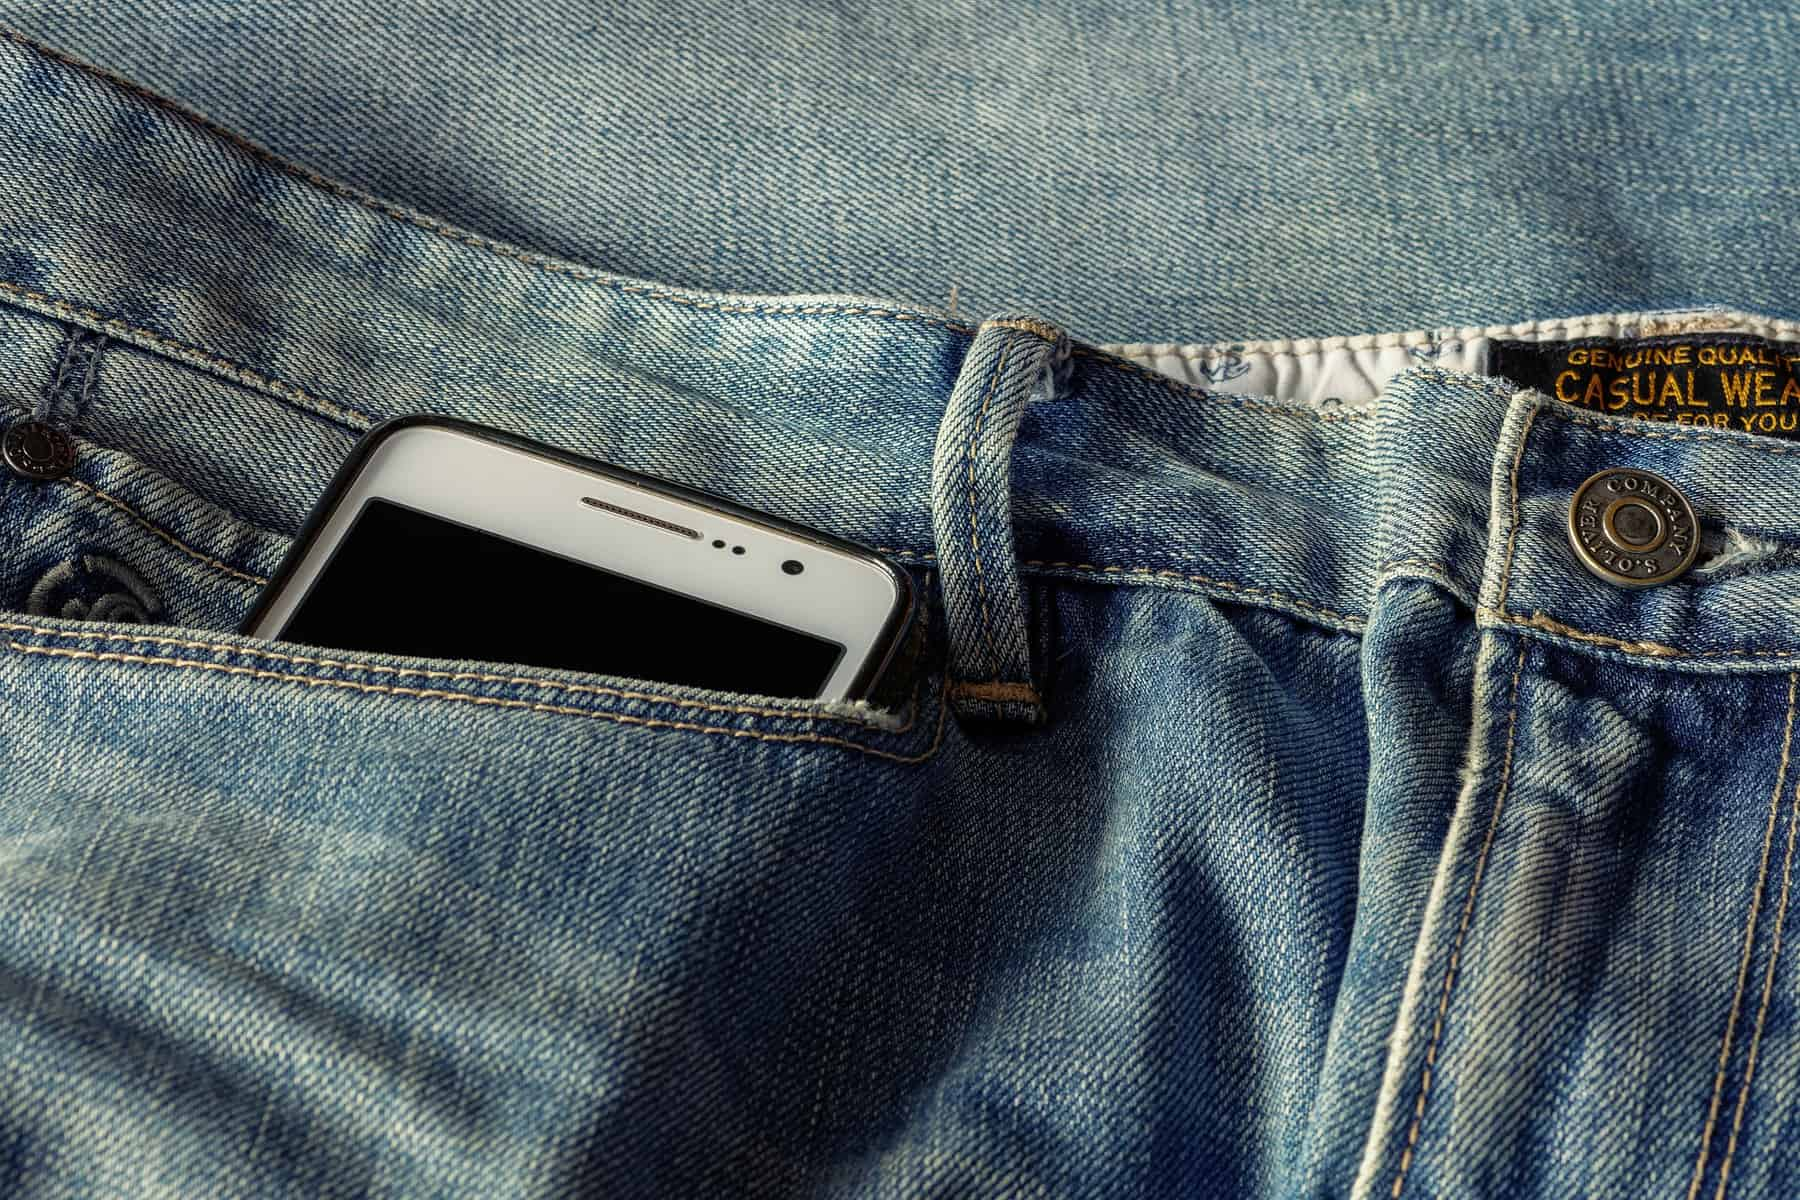 Un certain fond d'écran rend les smartphones Android inutilisables